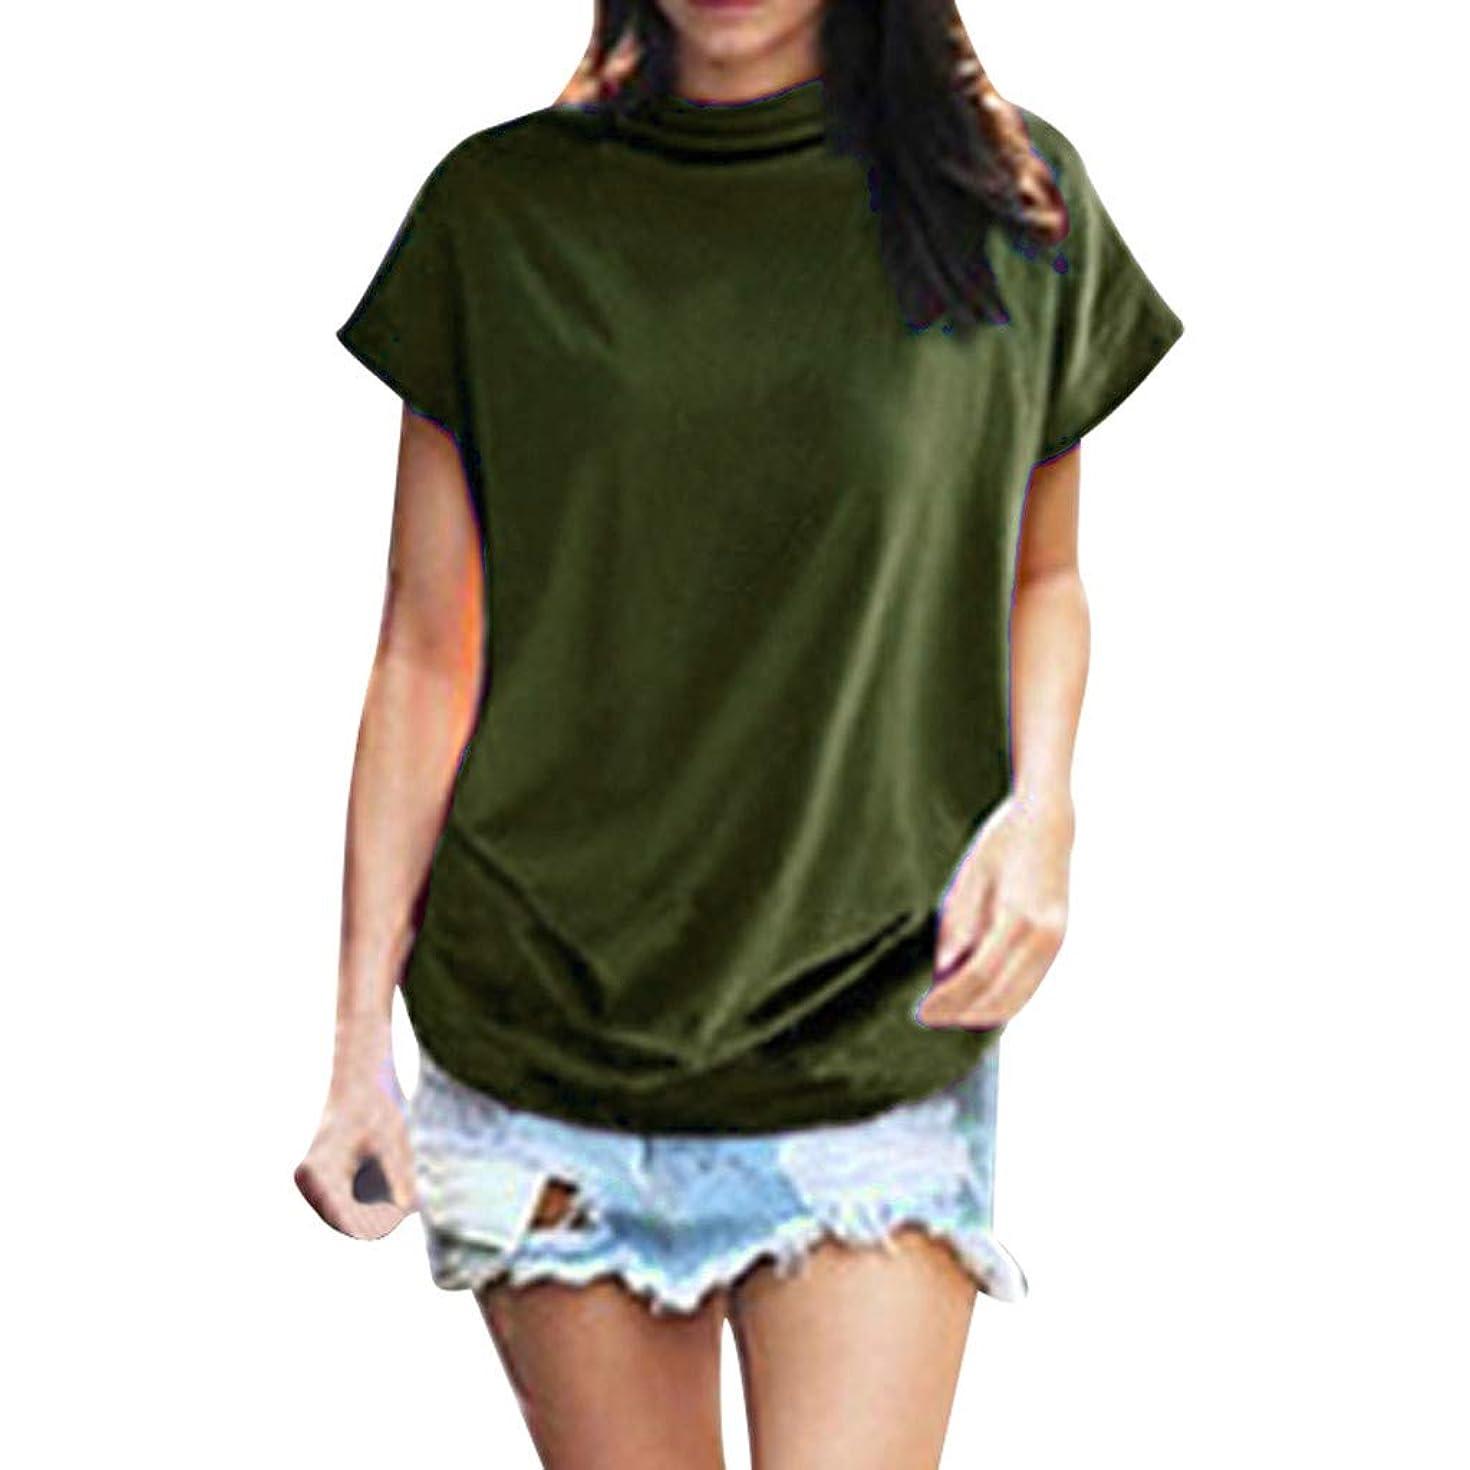 ??EDC 2019 Women's Summer Simple Cotton Solid Turtleneck T-Shirt??Casual Loose Soft Short Bat Sleeve Blouse Top Tees S-L5